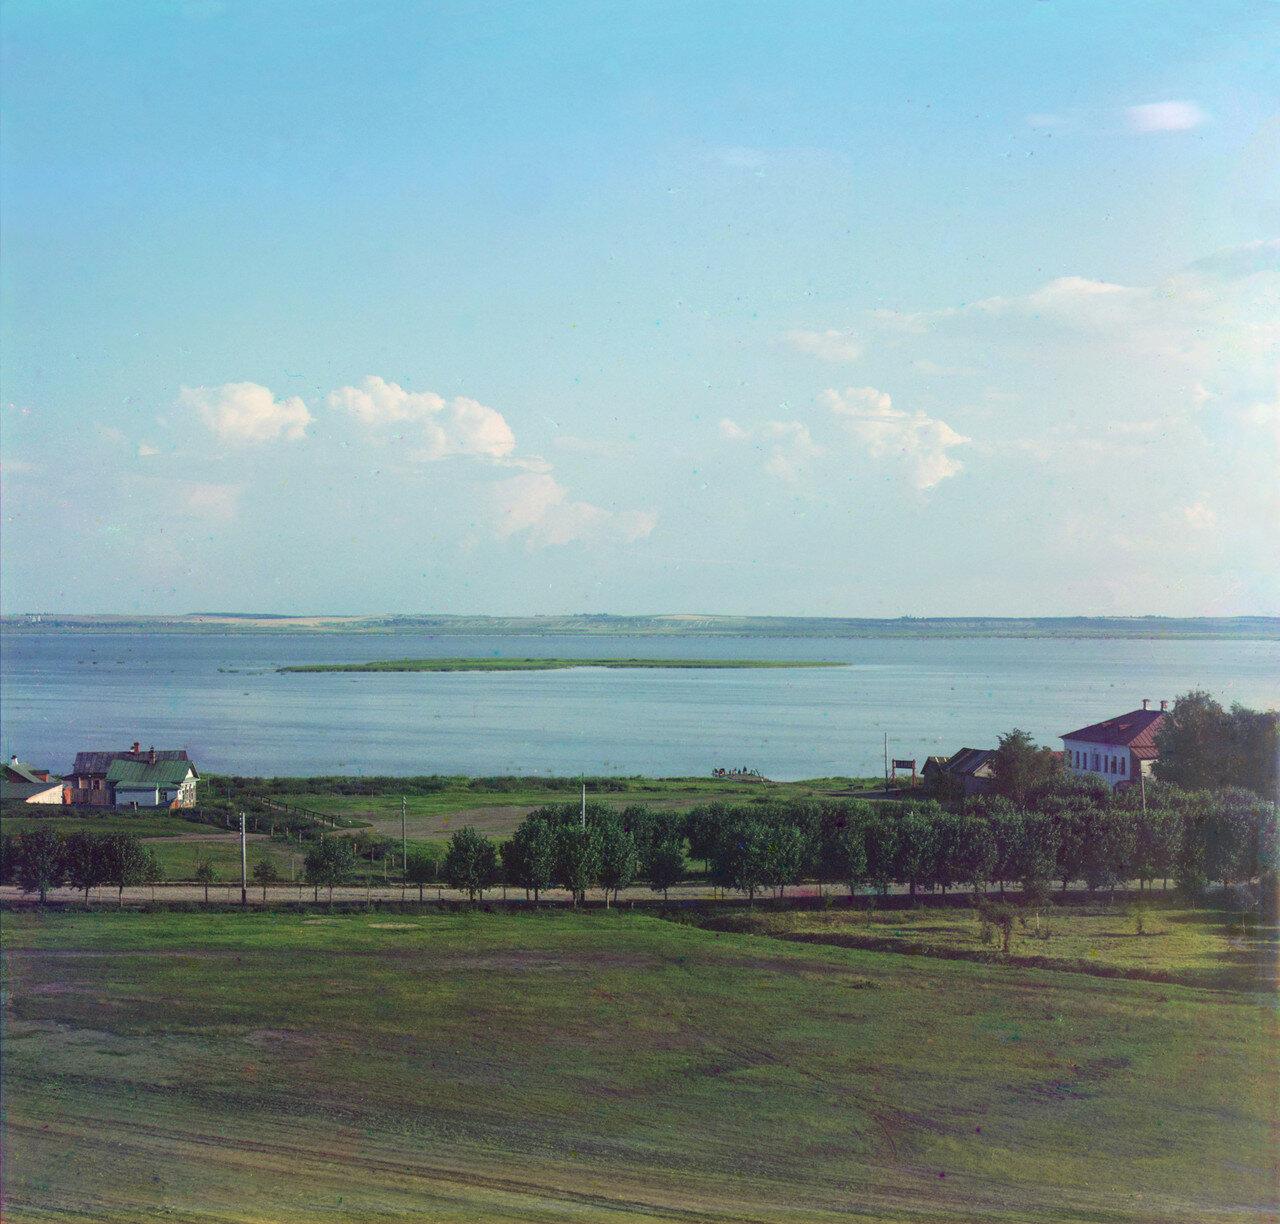 Вид на озеро Неро с колокольни Всесвятской церкви